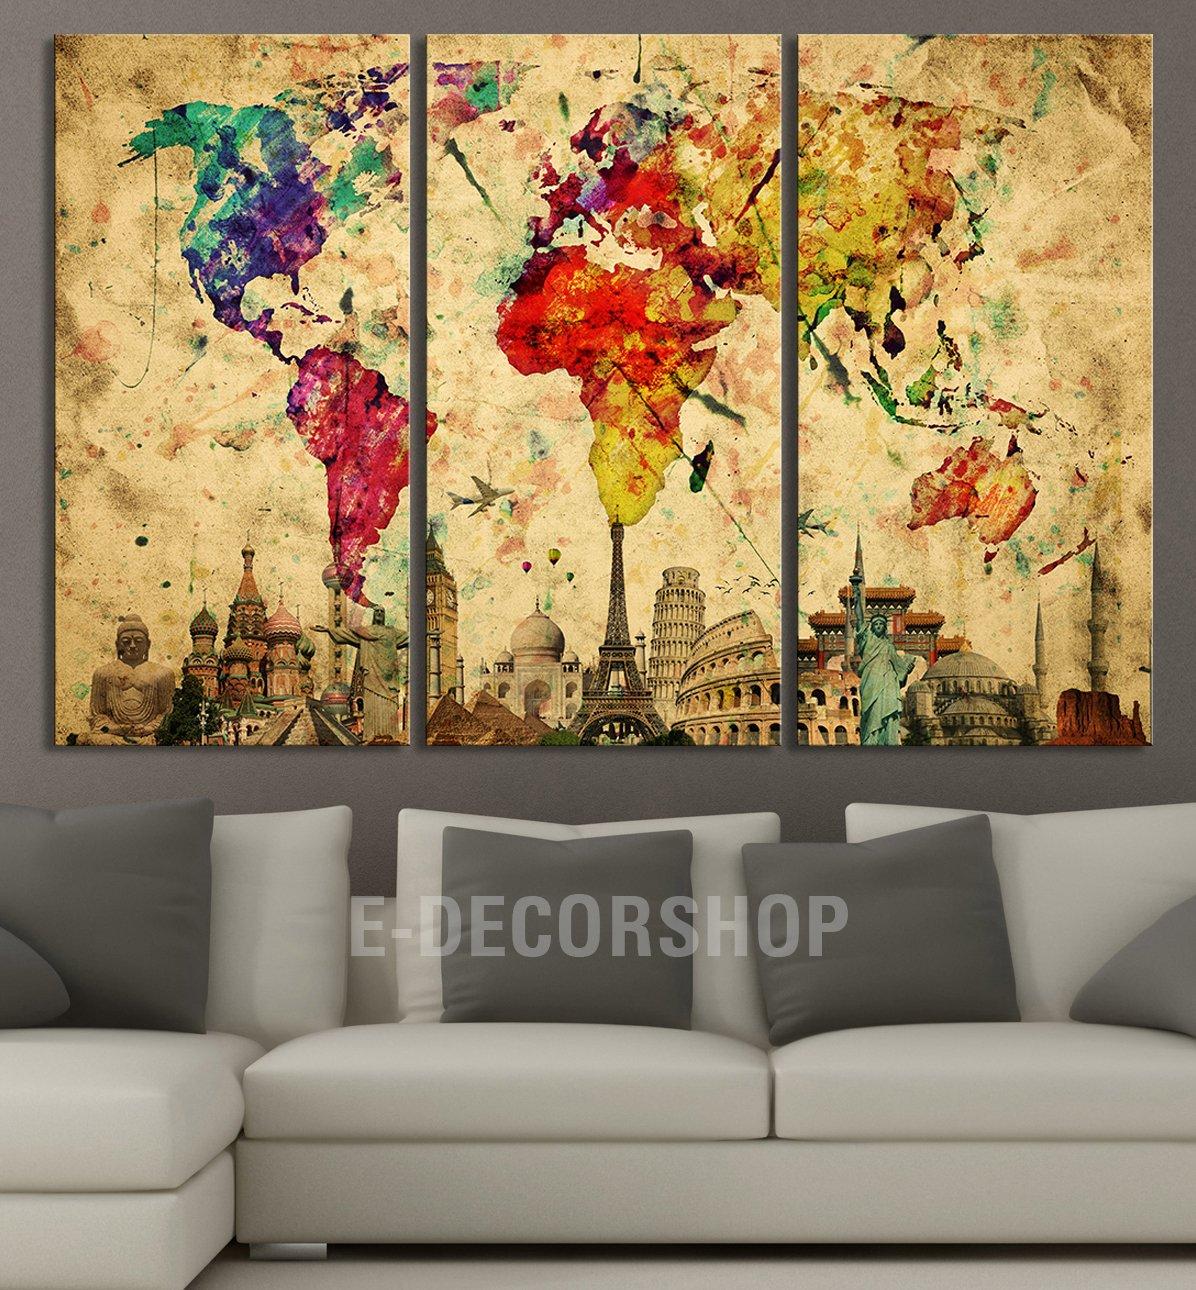 Amazon.com: Large Wall Art Canvas World Map - Yellow Predominantly ...